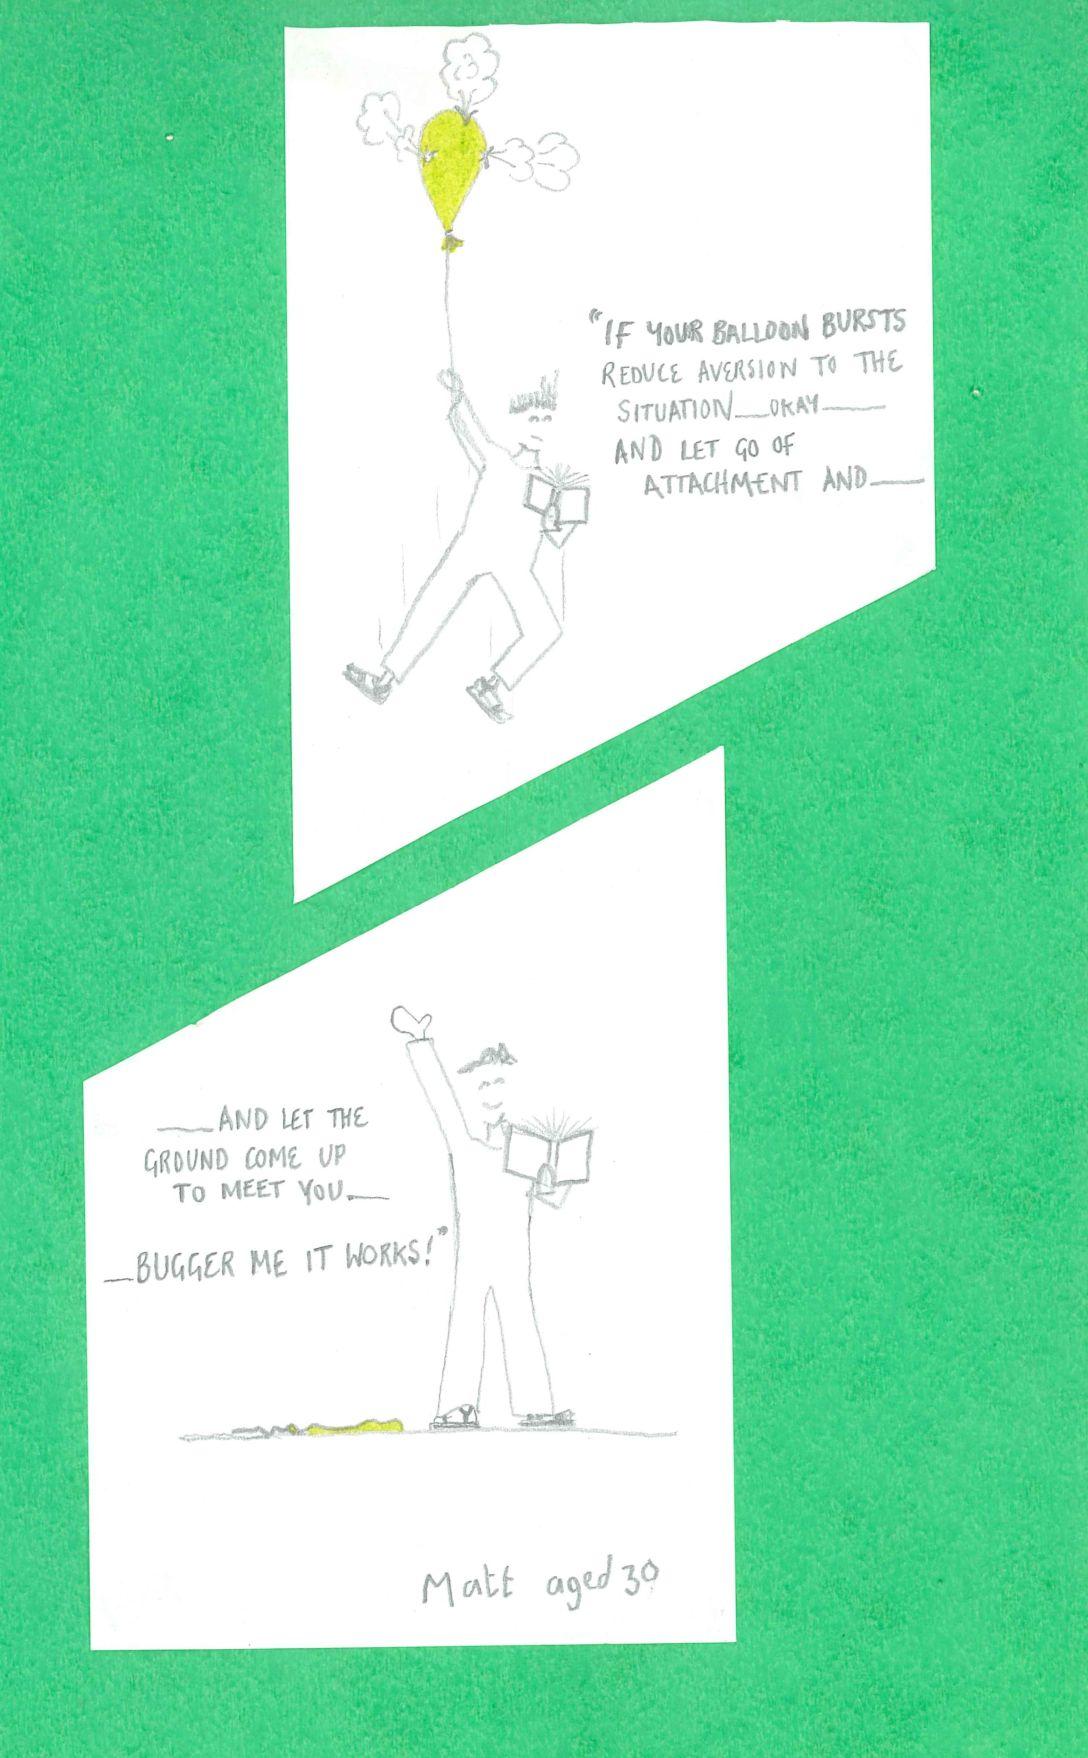 the ground cartoon